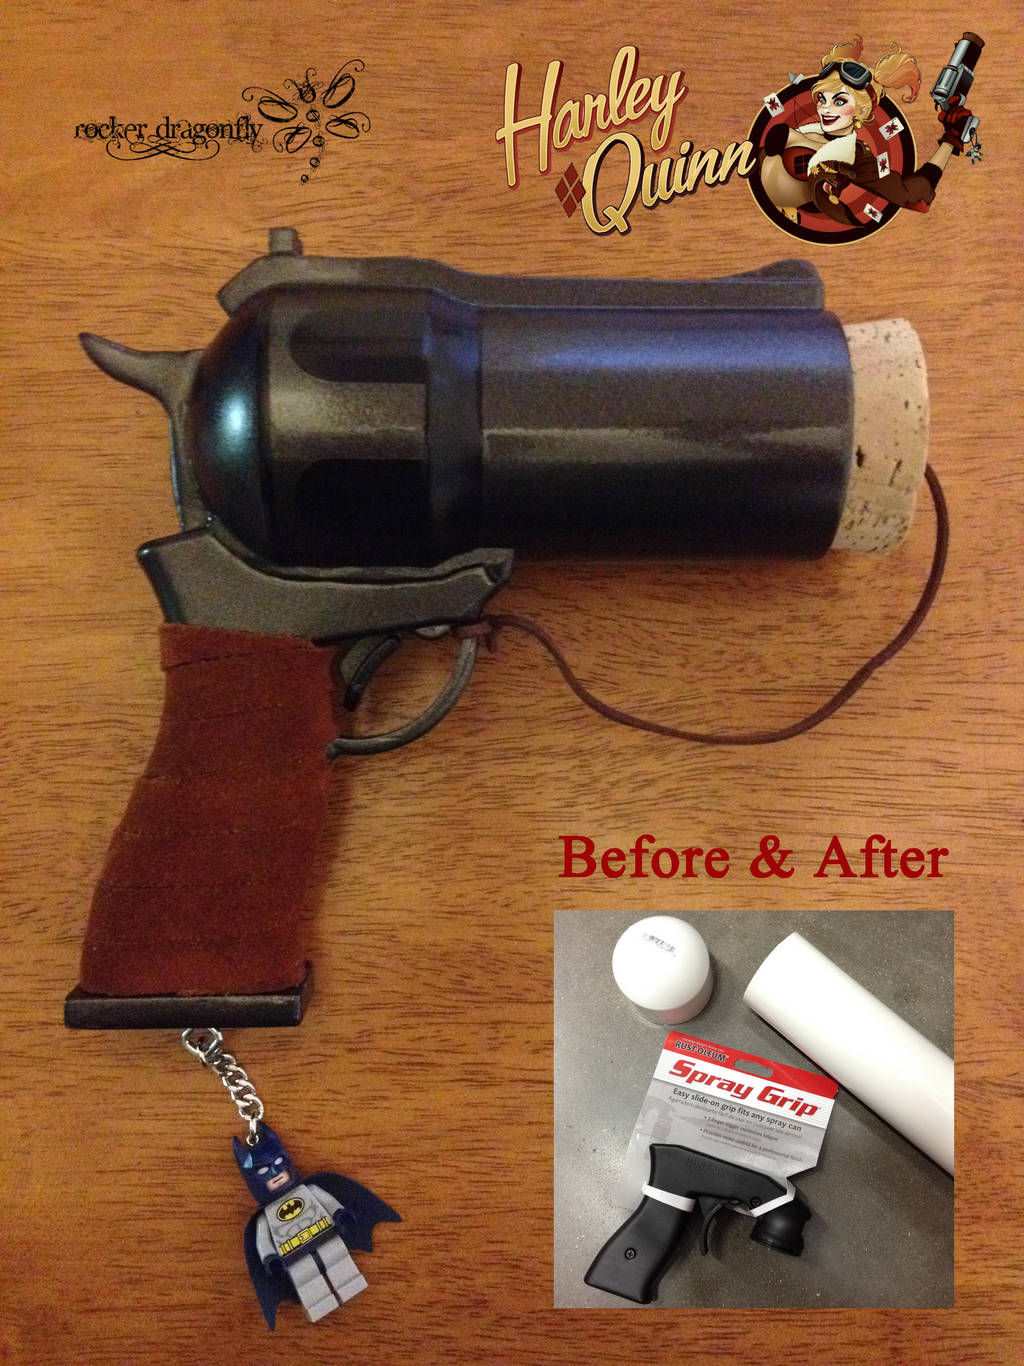 Harley Quinn Cork Gun by RockerDragonfly